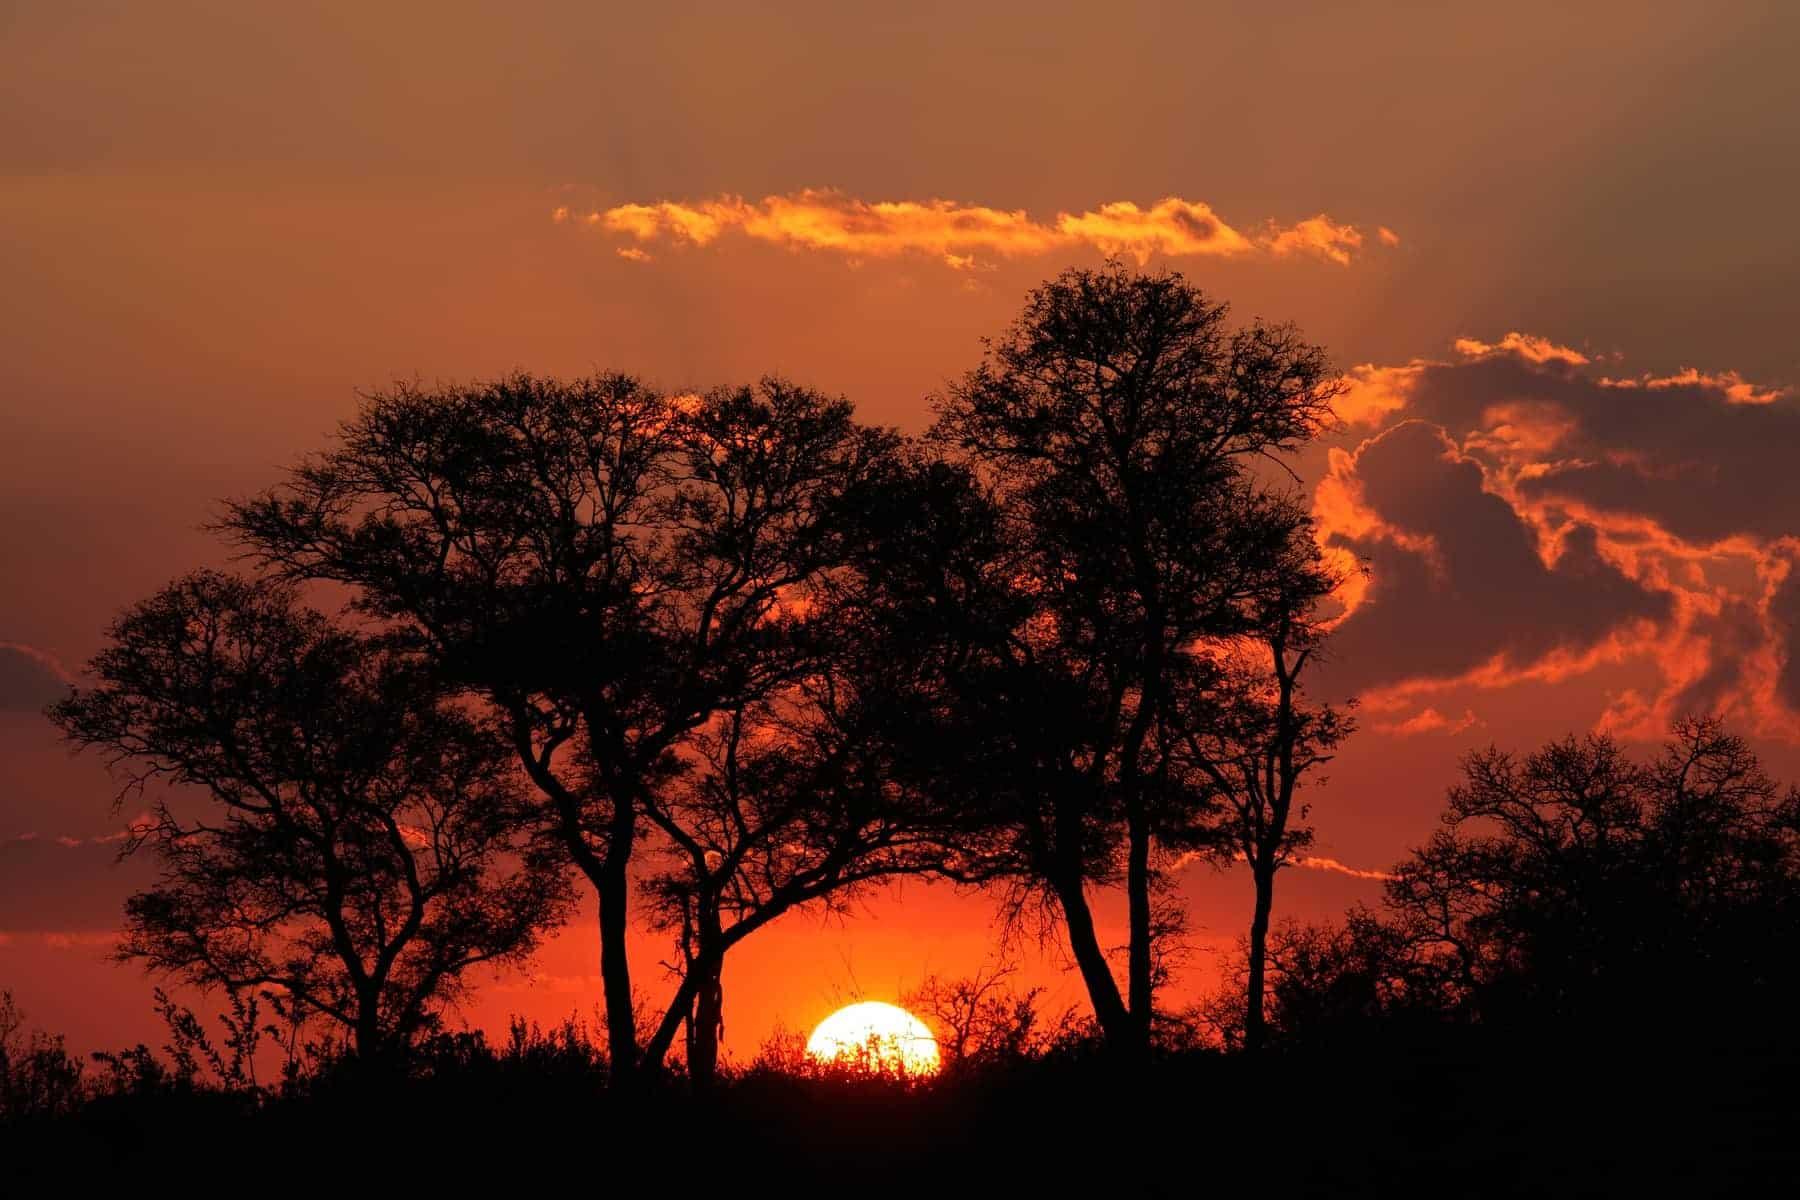 Safari i Sydafrika, Krüger Savanna sunset